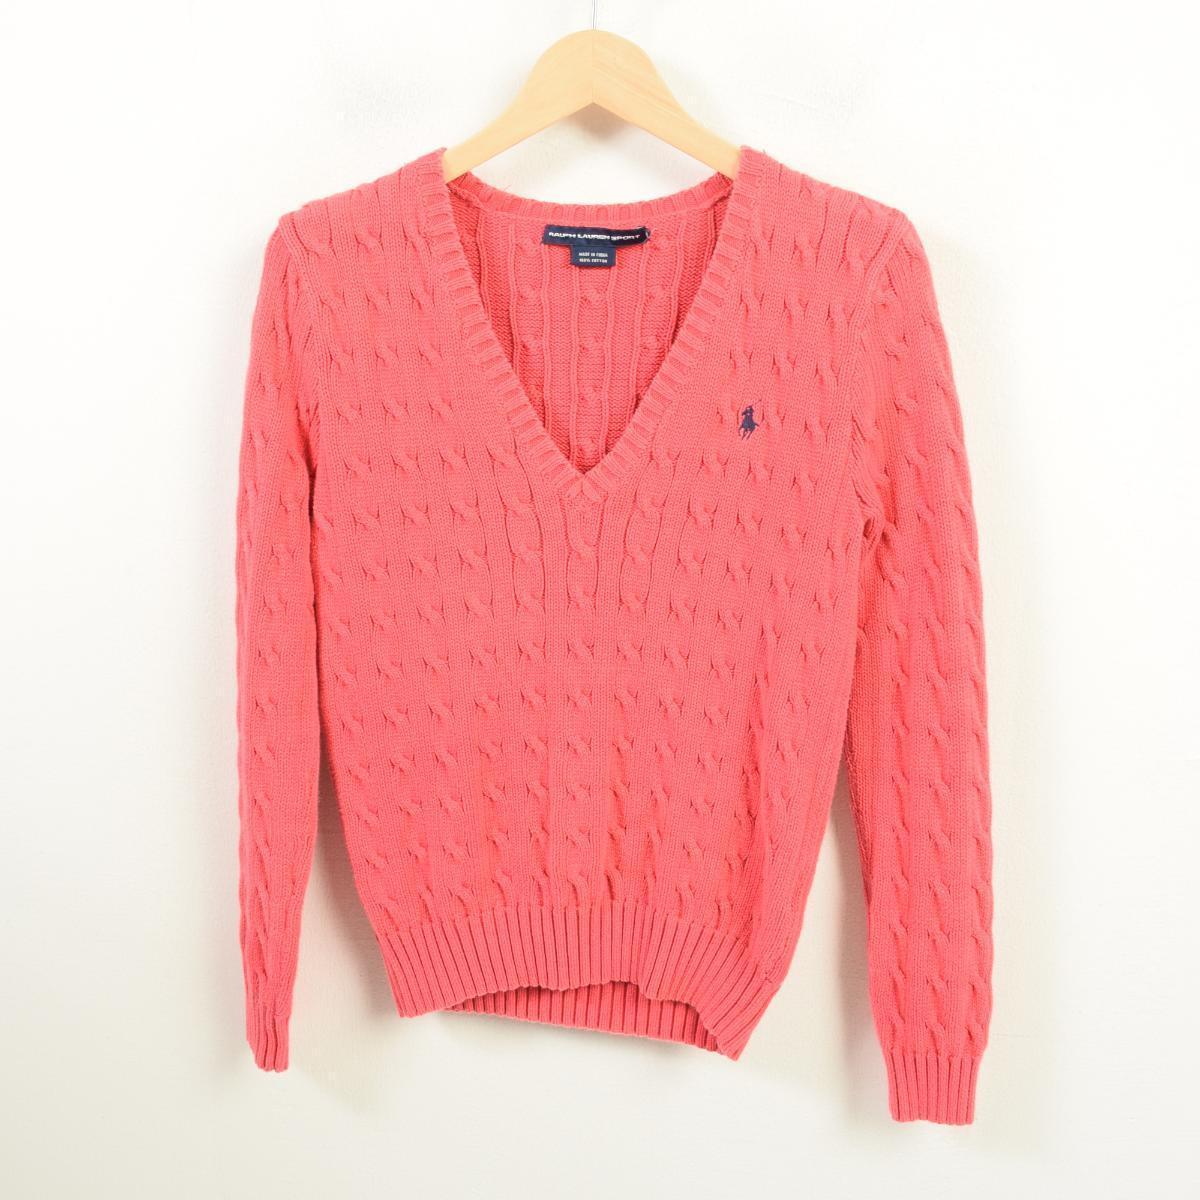 Ralph V Sweater Cotton Sports Lauren Sport Neck Knitting S Knit Lady's Wau3855 Polo Cable c43LA5qSRj